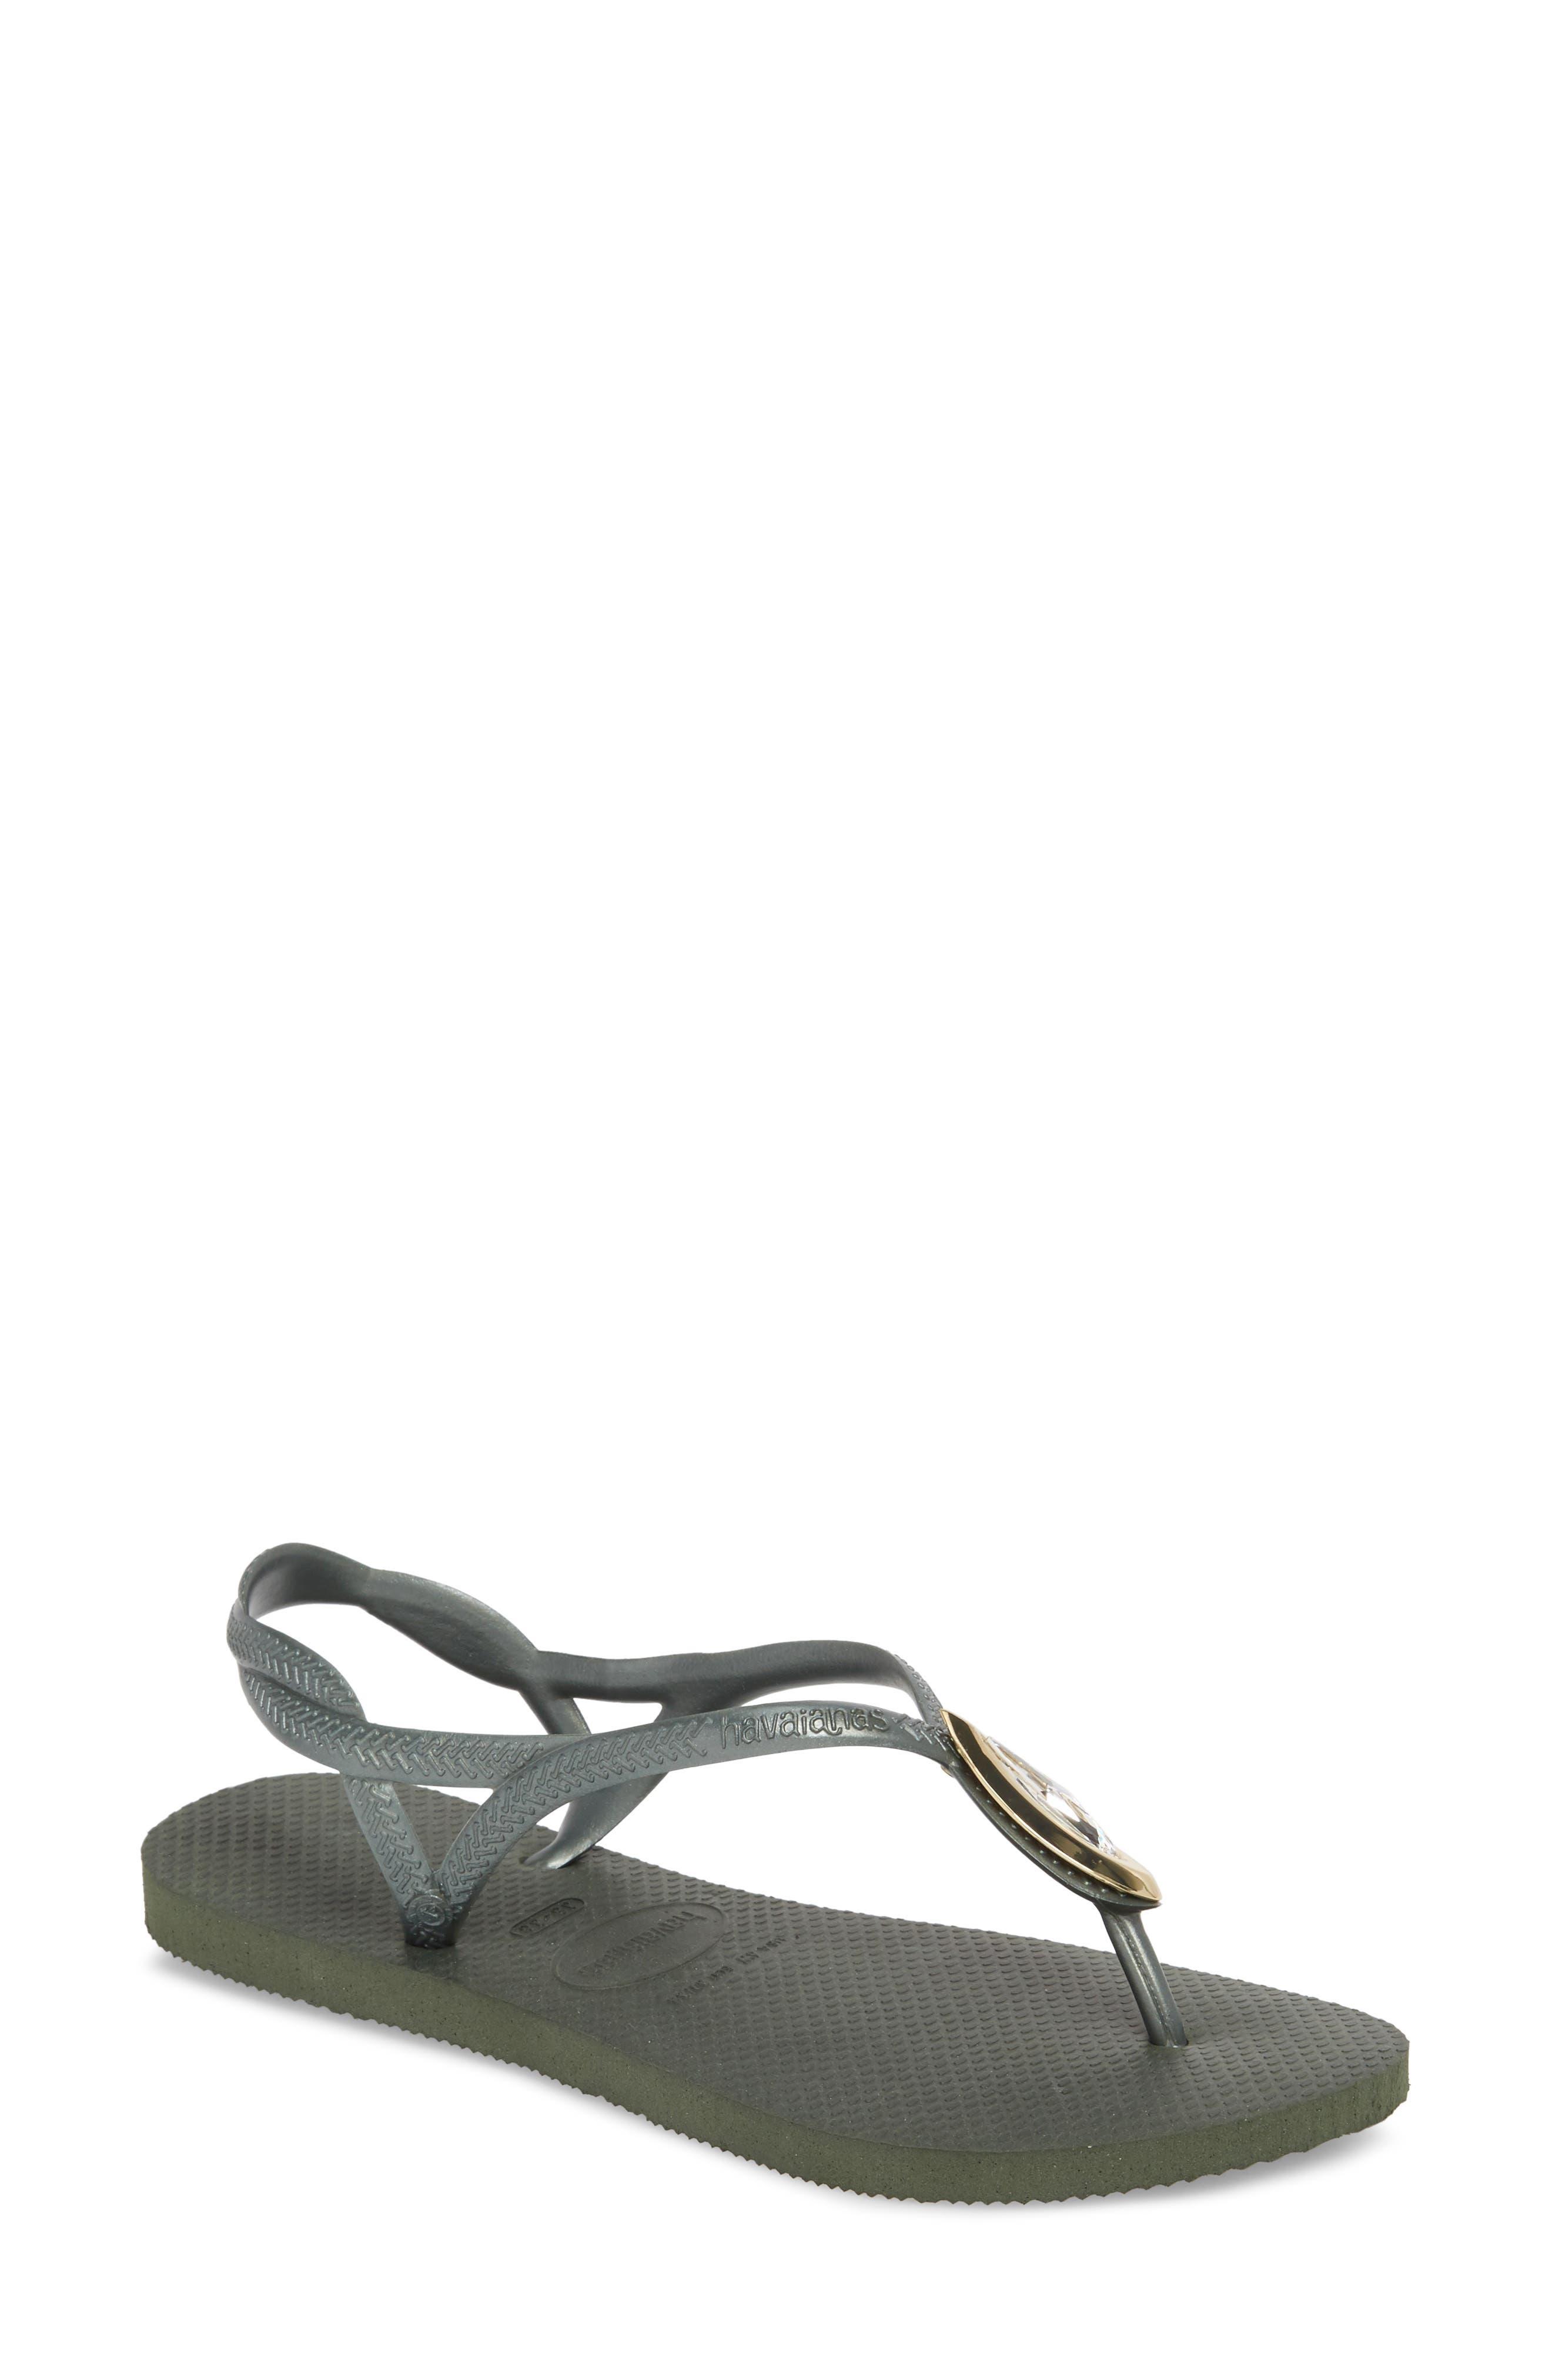 Luna Sandal,                             Main thumbnail 1, color,                             Green Olive